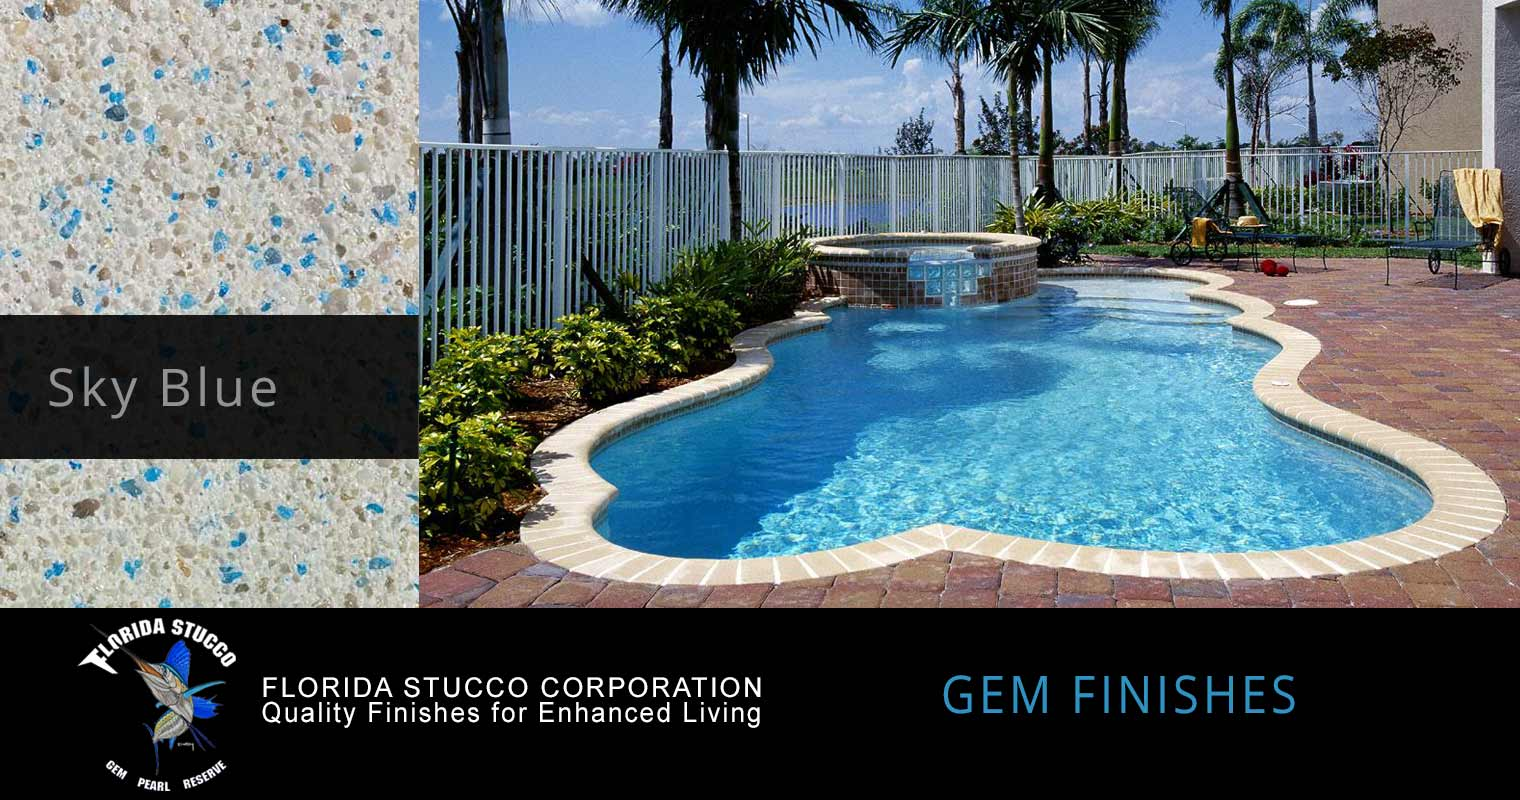 Florida Stucco - Sky Blue Plastering Finish Pool Sample 1